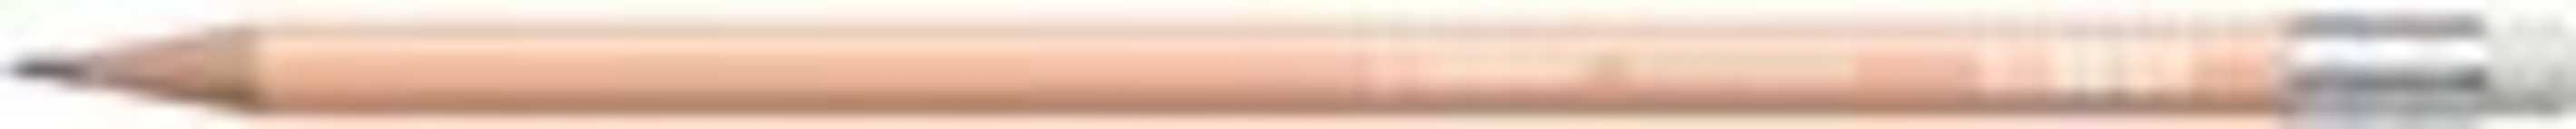 Stabilo potlood Swano pastel, oranje, met gom